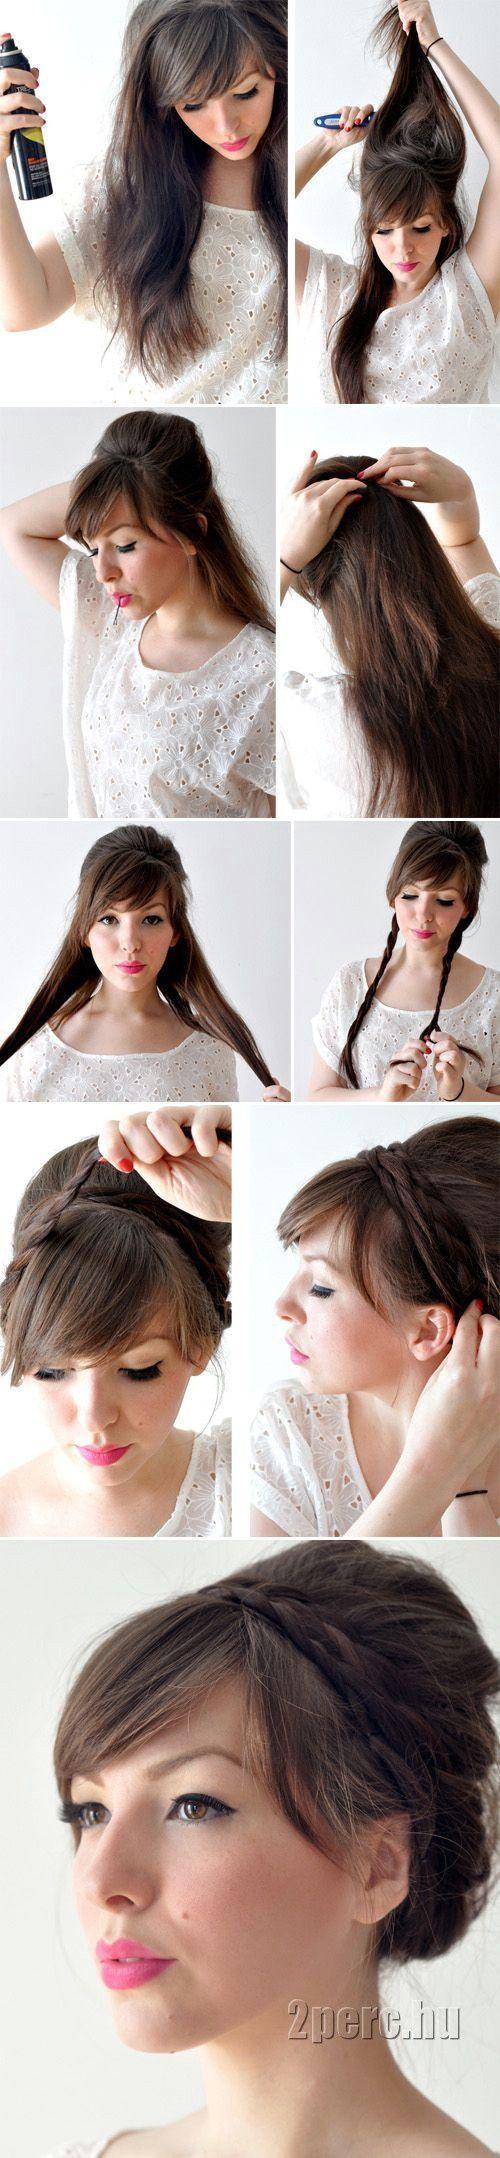 diy hair idea braided #diy fashion #diy decorating ideas| http://decoratedcookies3018.blogspot.com